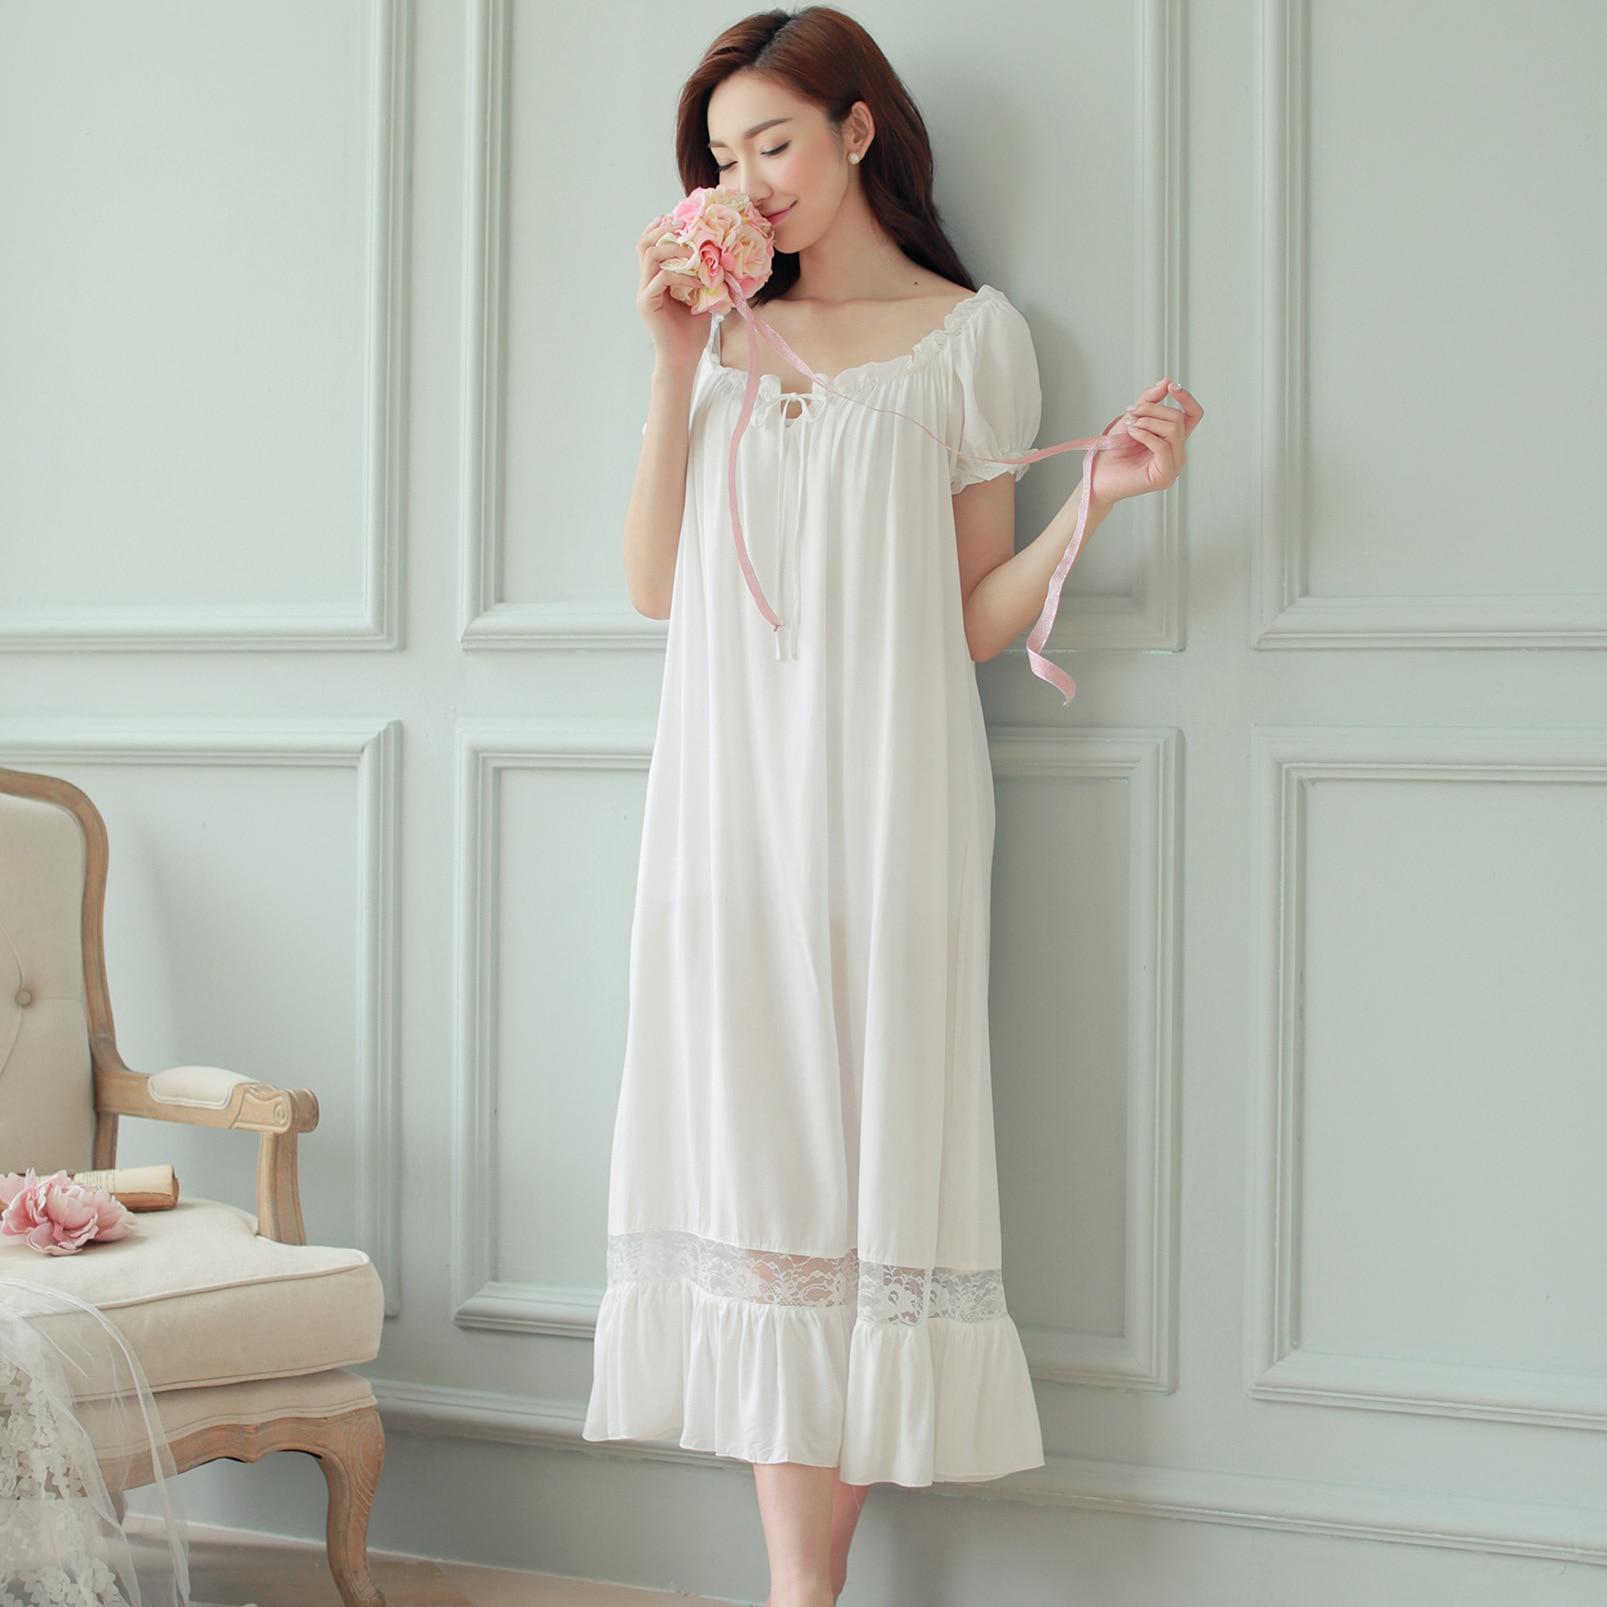 Vestido de noite longo branco camisola Das Mulheres Camisolas De Algodão de Manga Curta roupa de dormir sexy vestido sleepwear pijama camisola do vintage